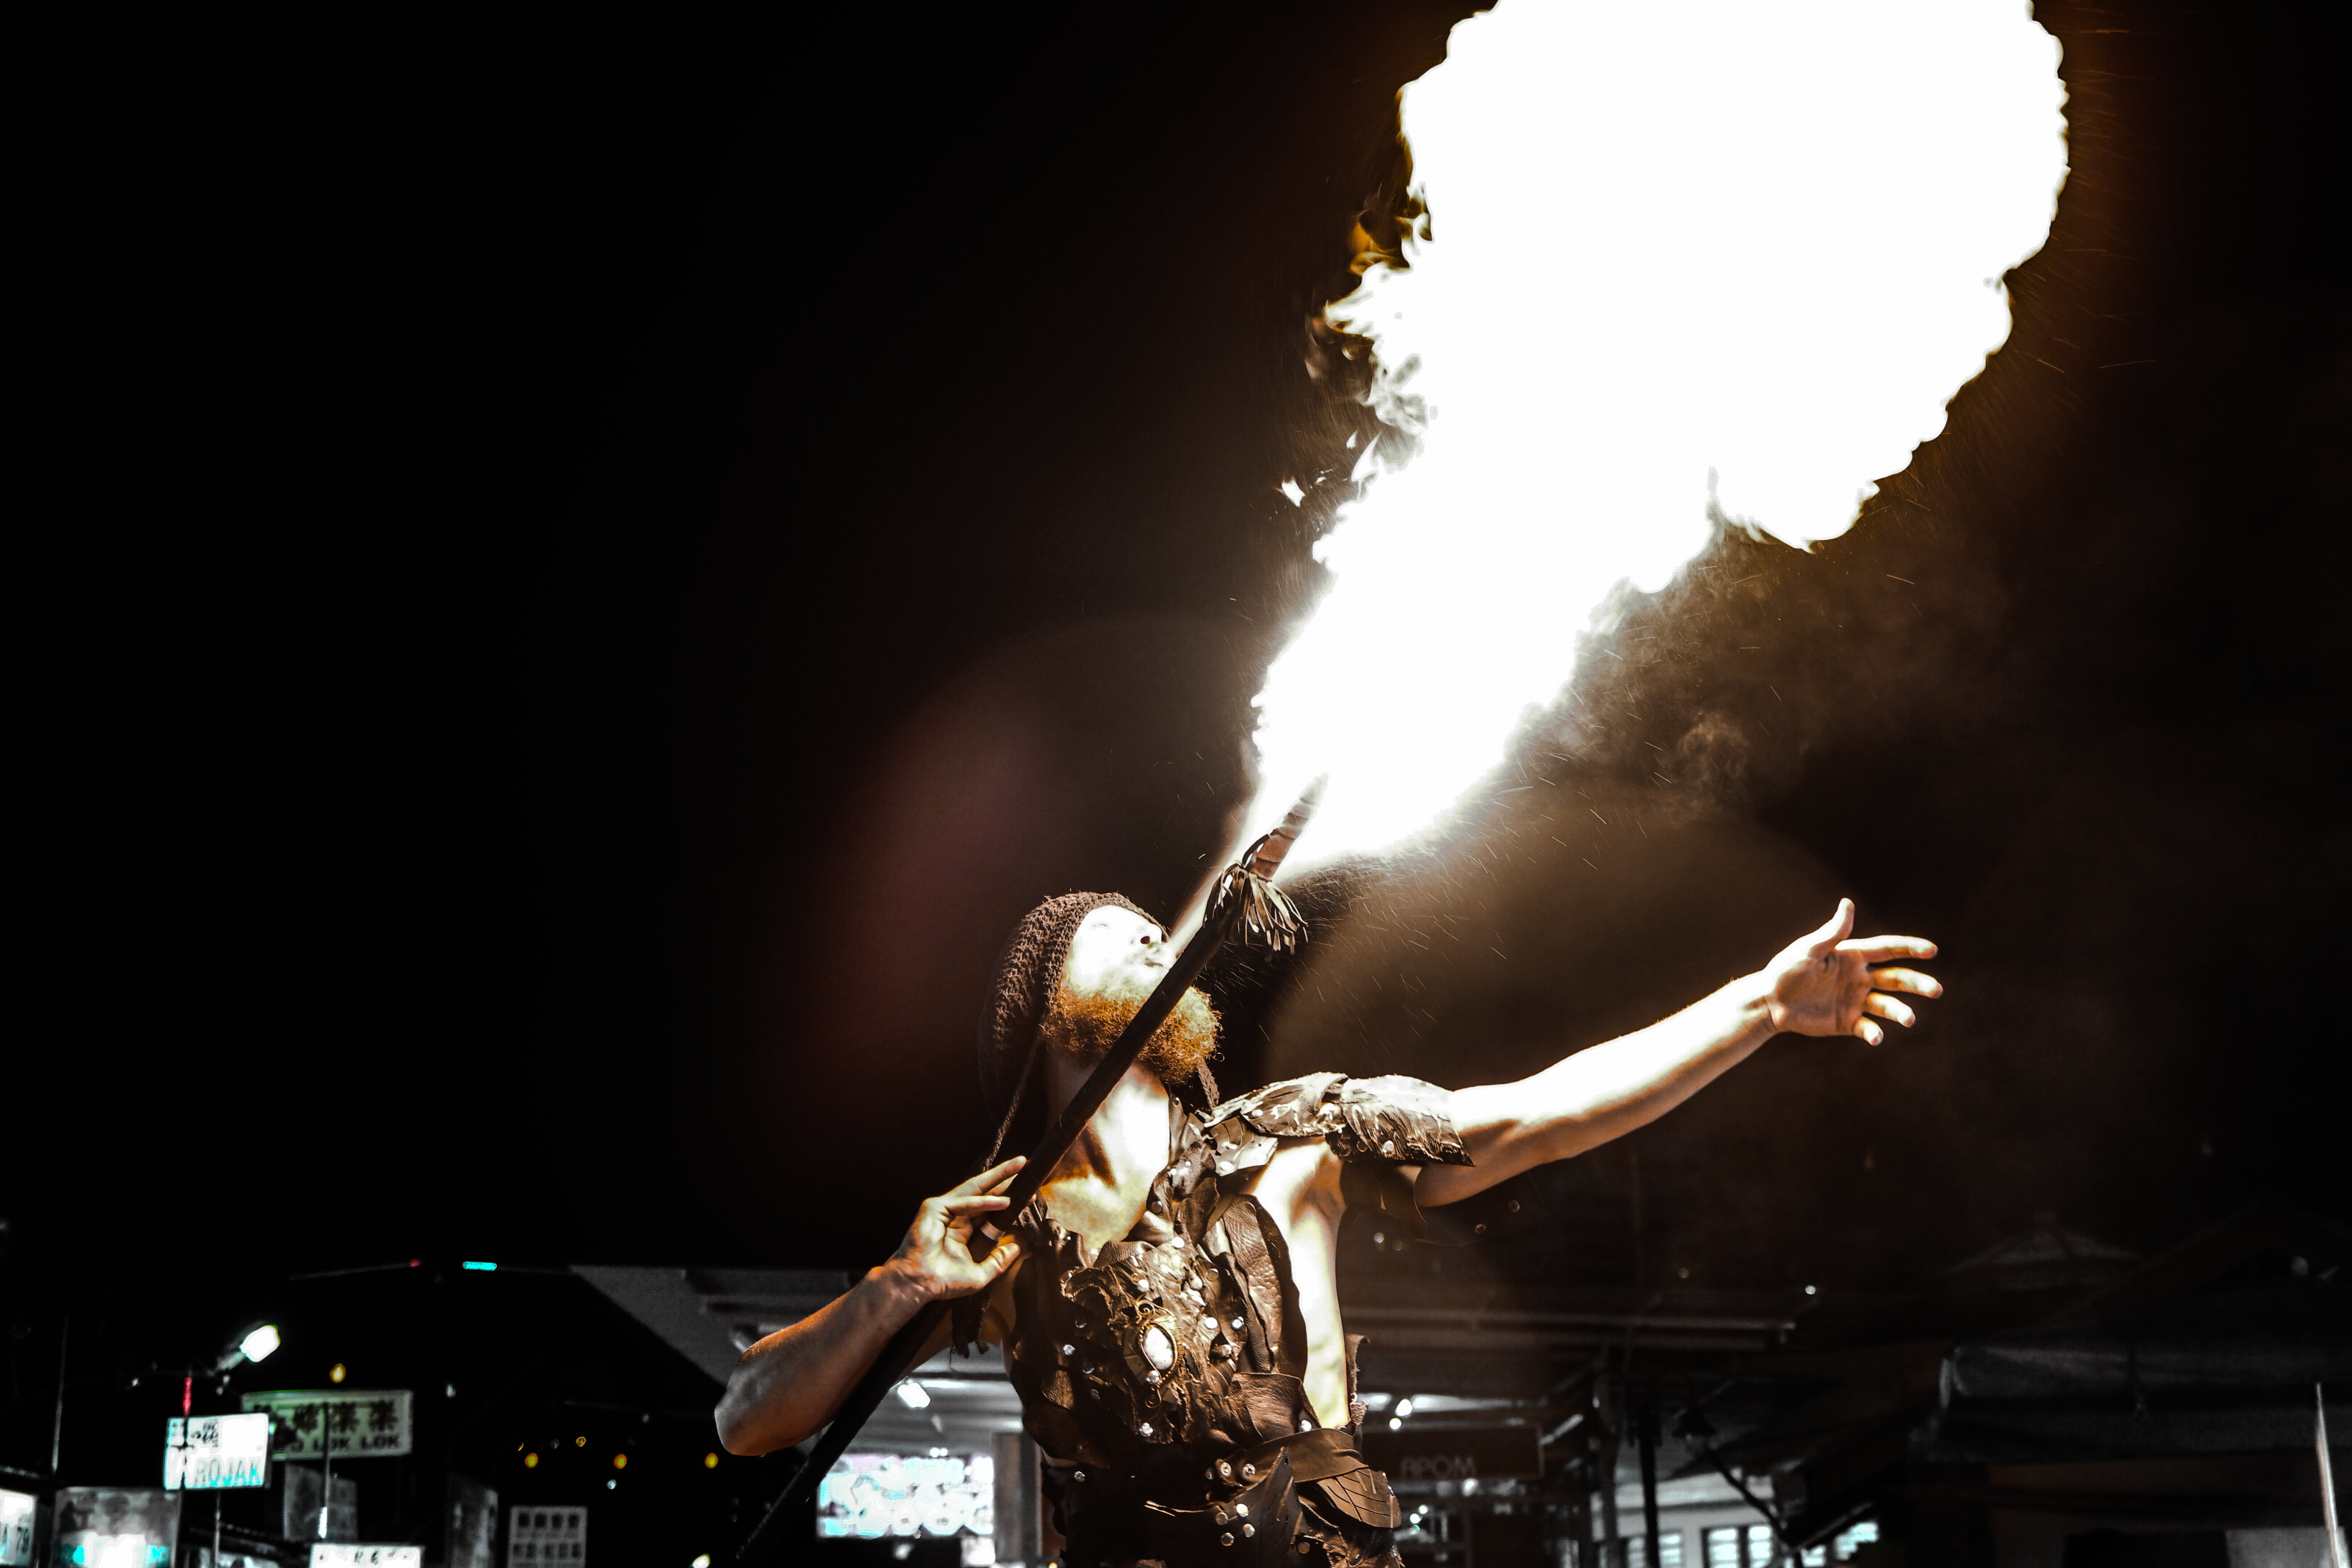 Free stock photo of man, fire, street artist, street performer